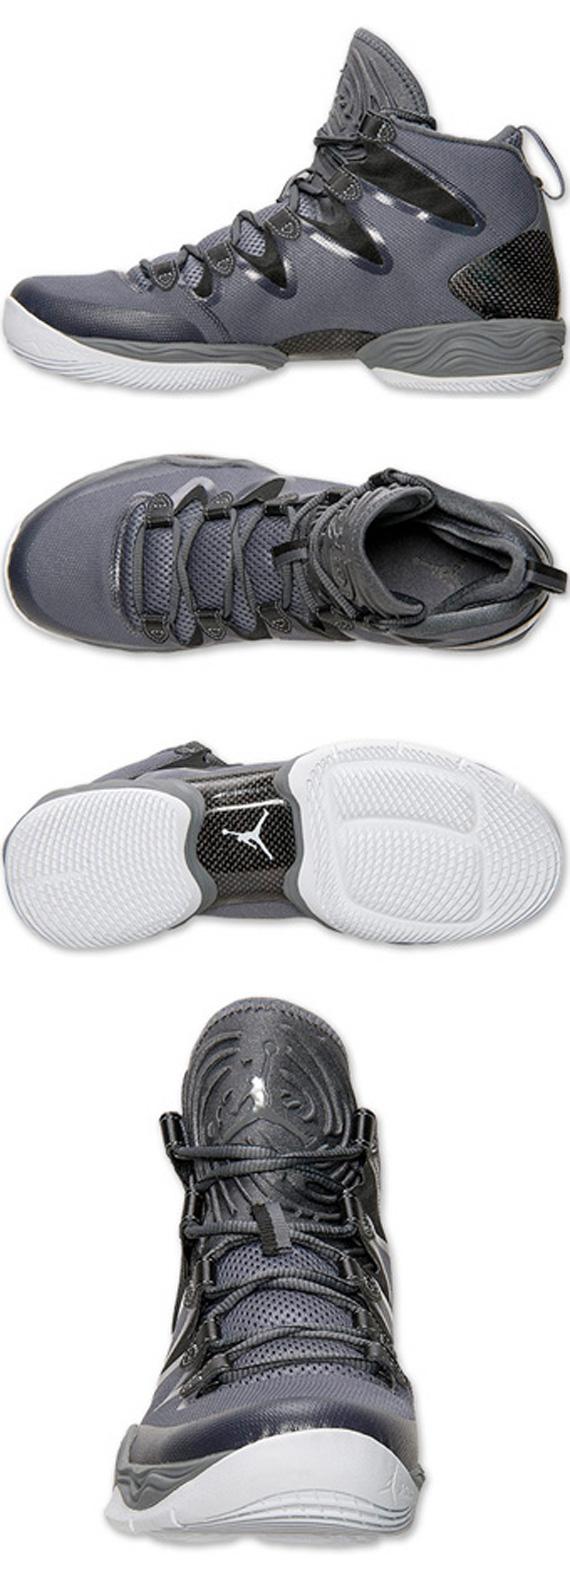 Air Jordan XX8 SE Dark Grey Release Date